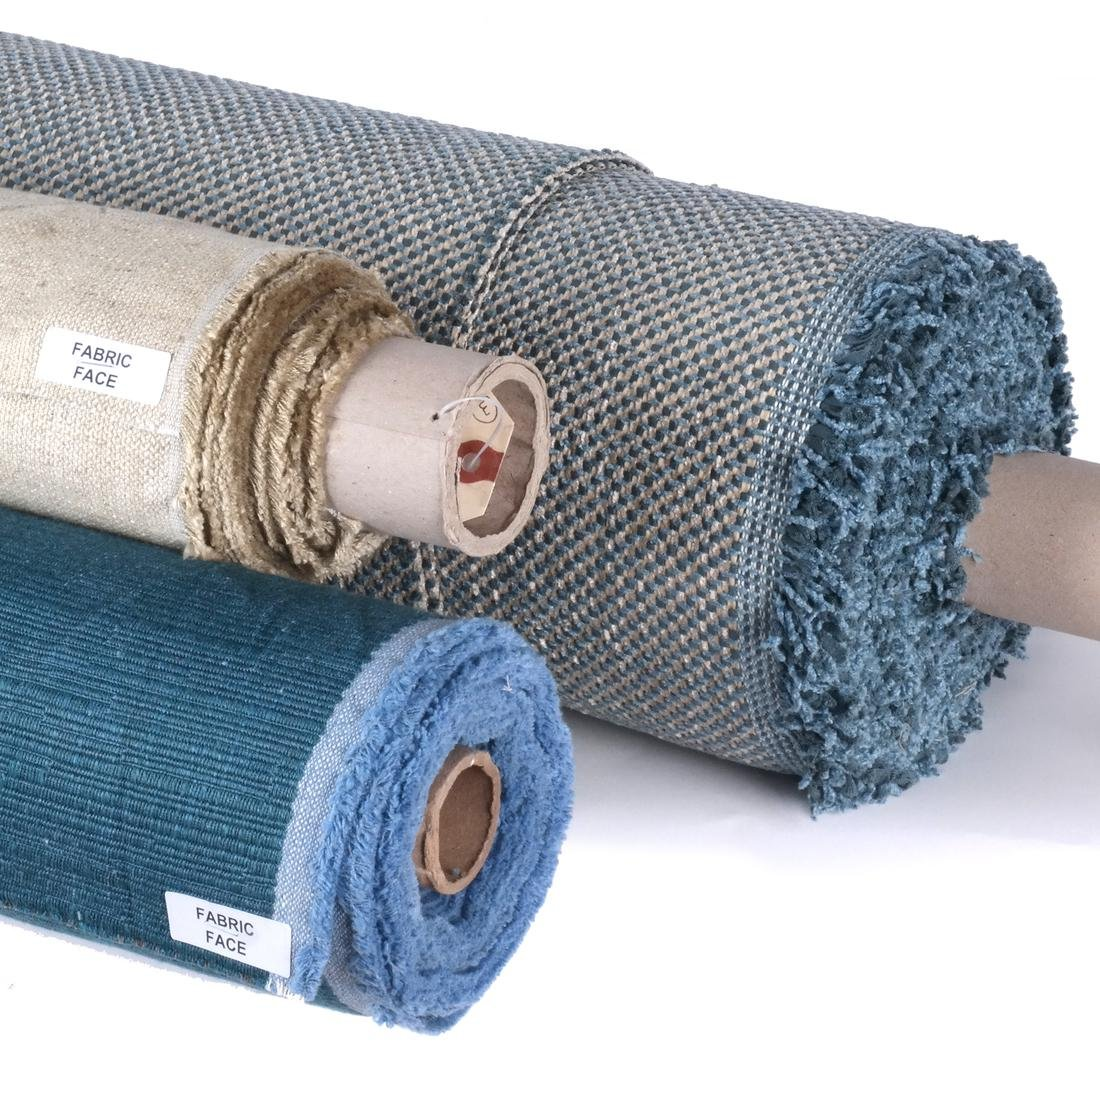 Cowtan & Tout, Zoffany, Allen - Fabrics